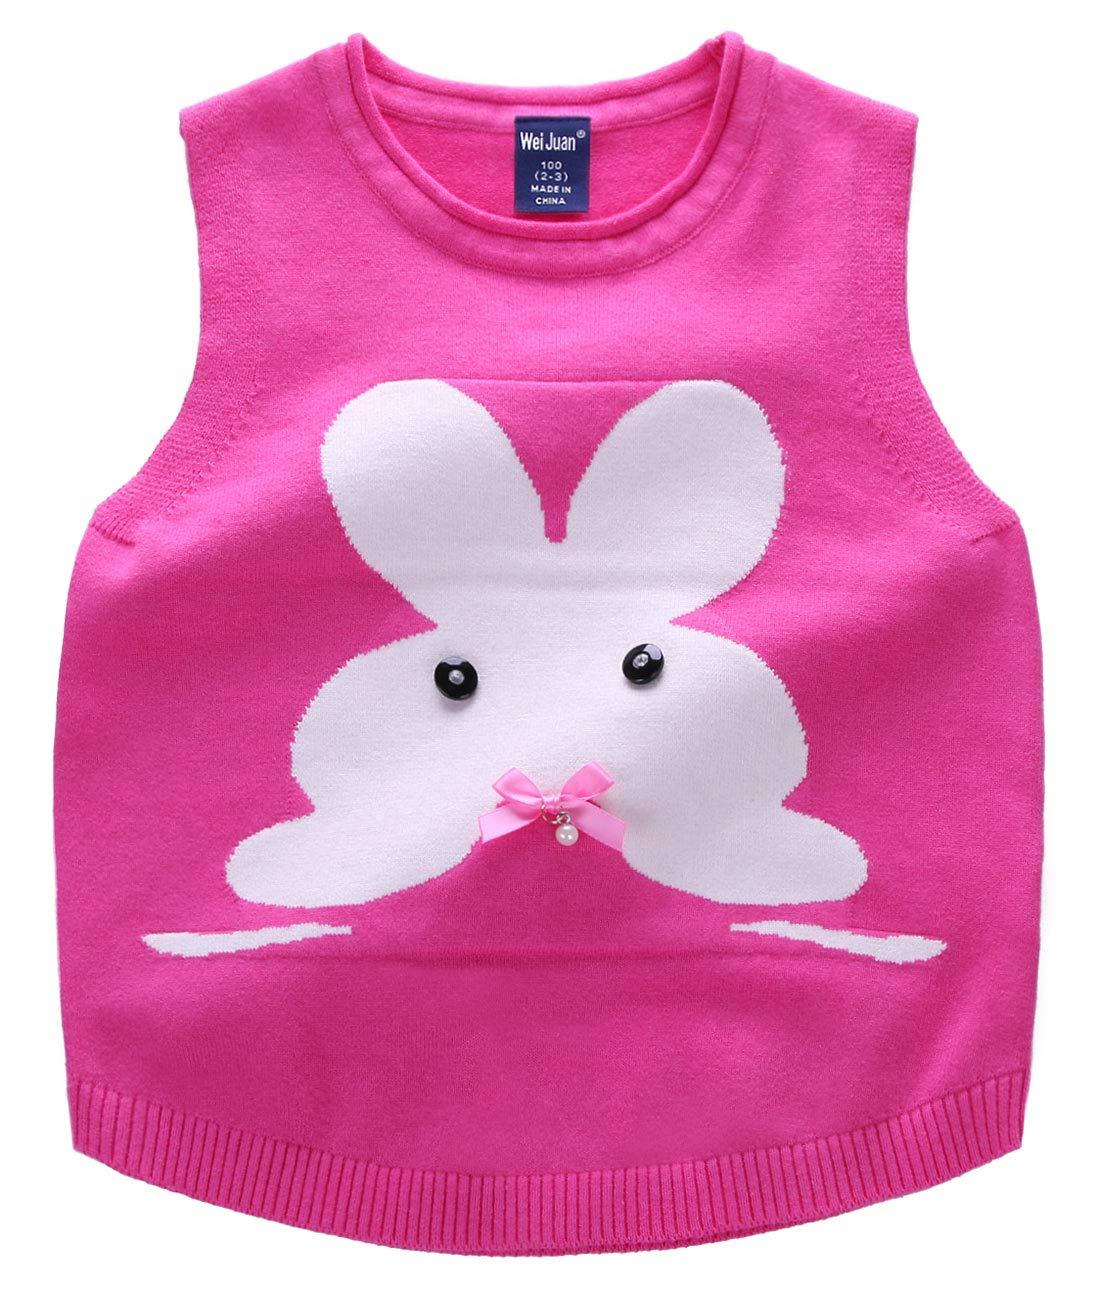 Girls Sweater Vest Durable Sleeveless Pullover Rabbit Pattern Bowknot Round Neck Gilet 4-5T Rose